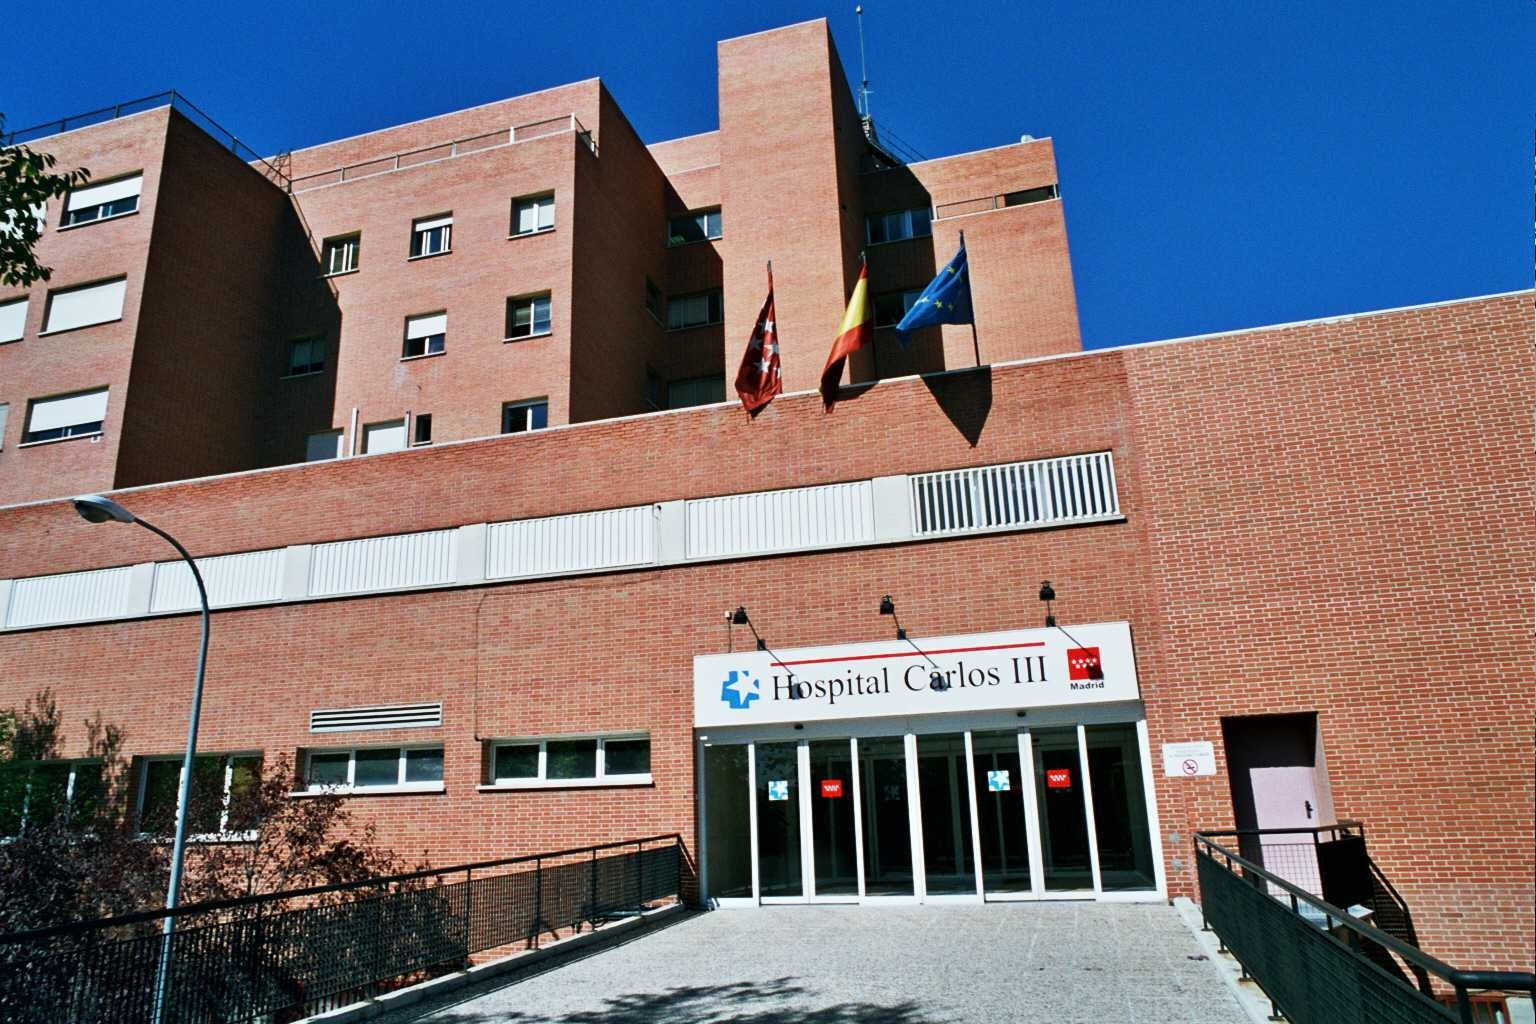 hospital la paz - carlos iii